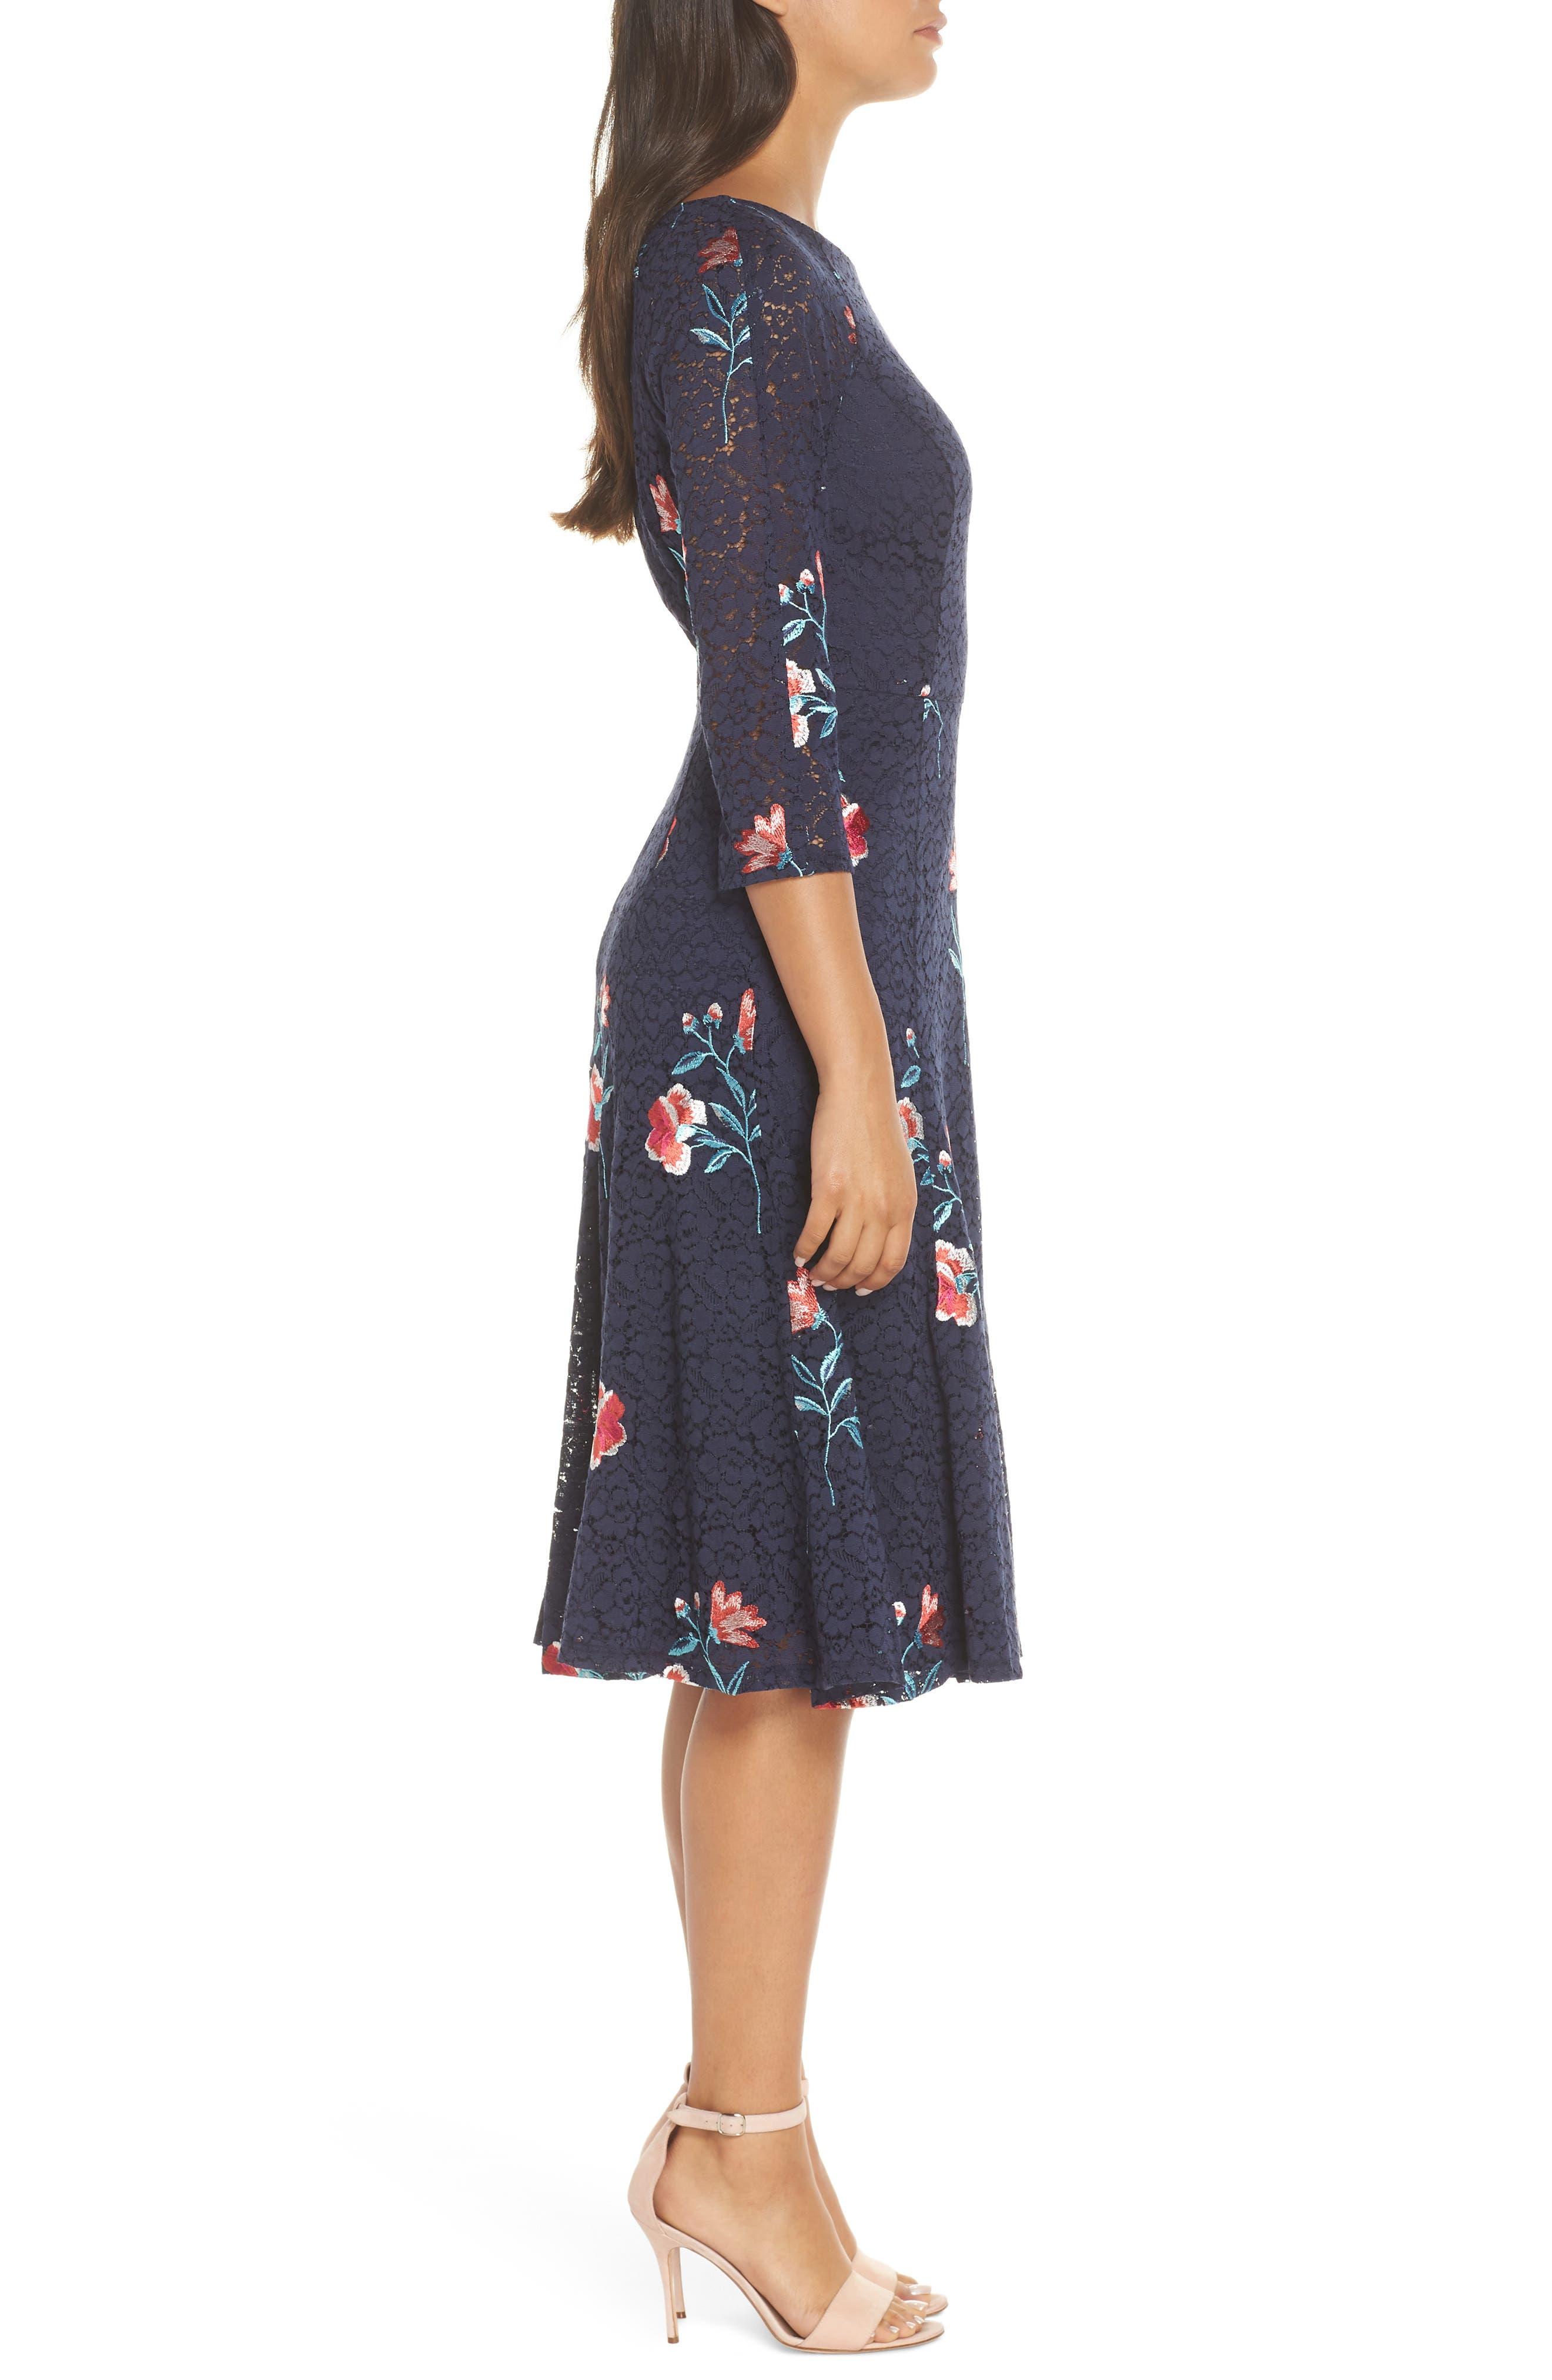 ELIZA J, Embroidery & Lace A-Line Dress, Alternate thumbnail 4, color, NAVY